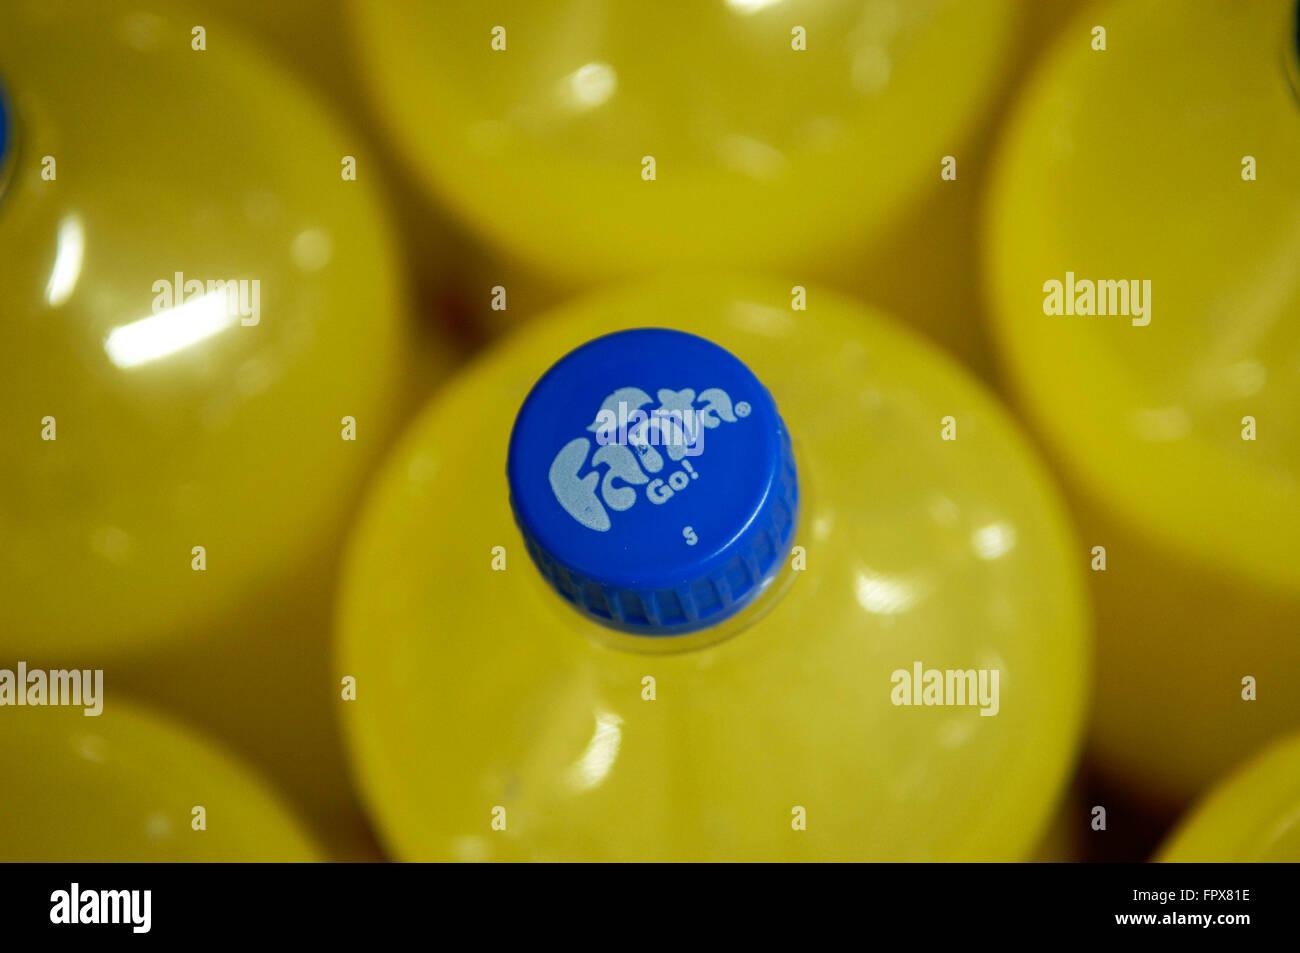 Fanta Orange Drink bottle lid shot from above in a Carrefour supermarket Malaga Spain. - Stock Image